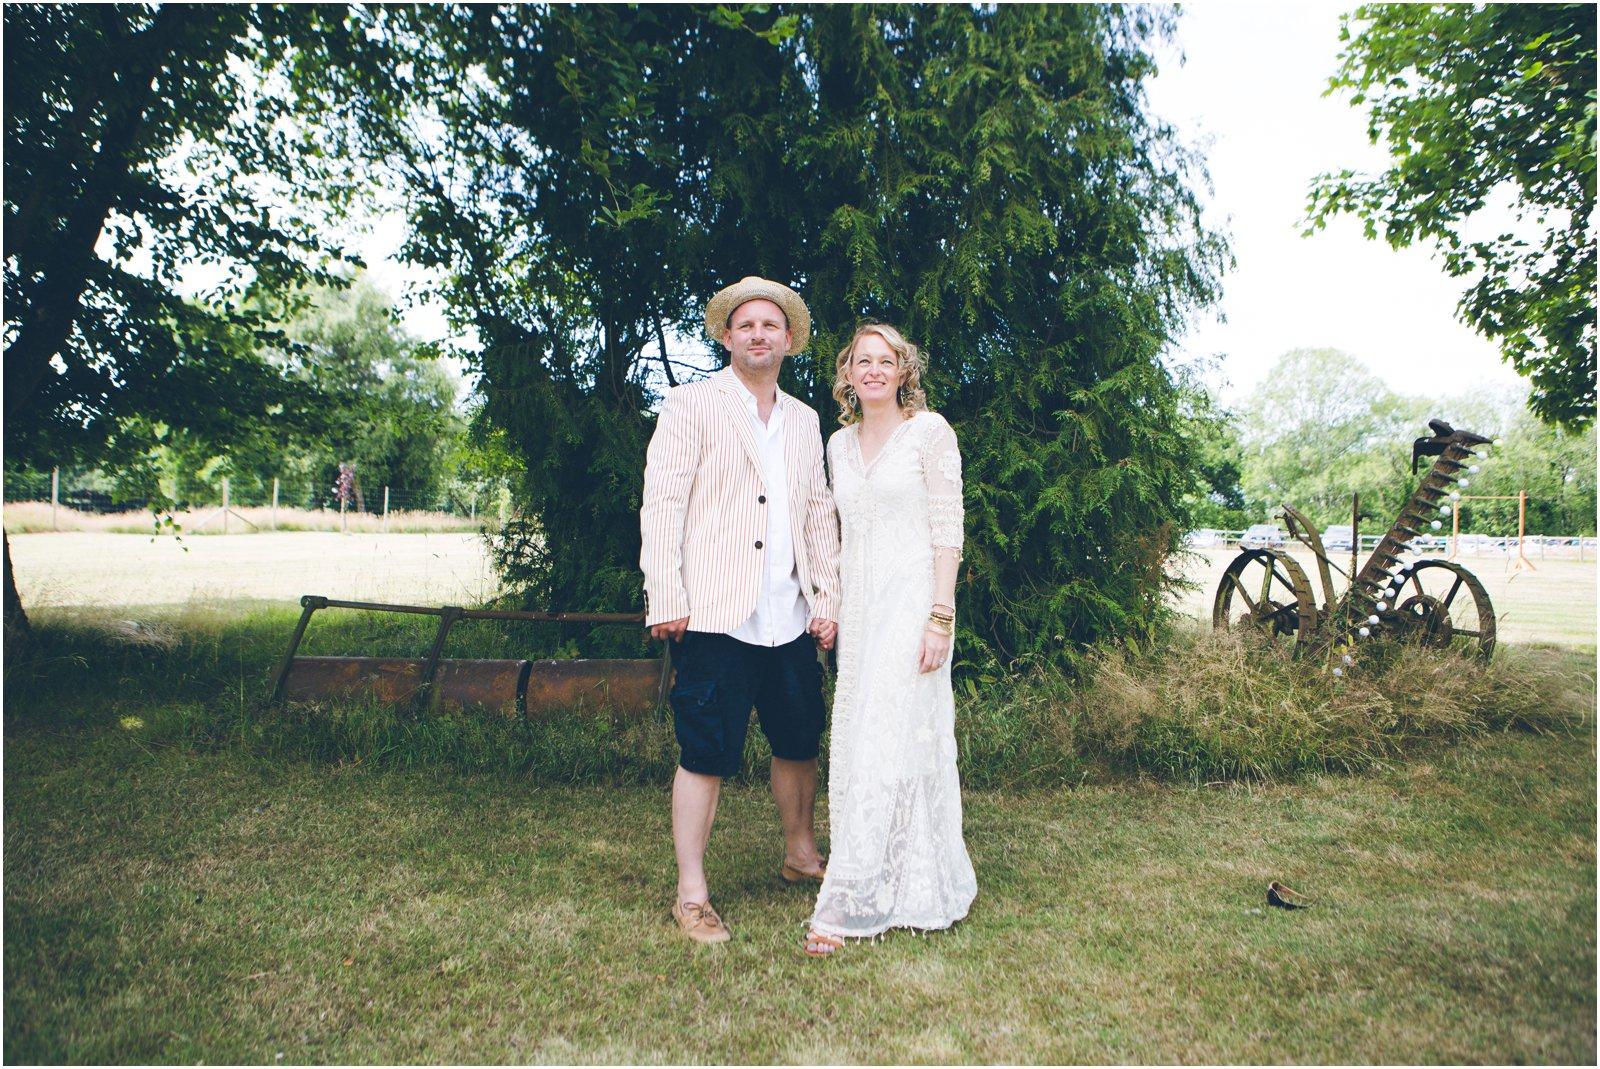 Sally and Damien's wedding festival by Summertown Pictures-33_DerrynSchmidt